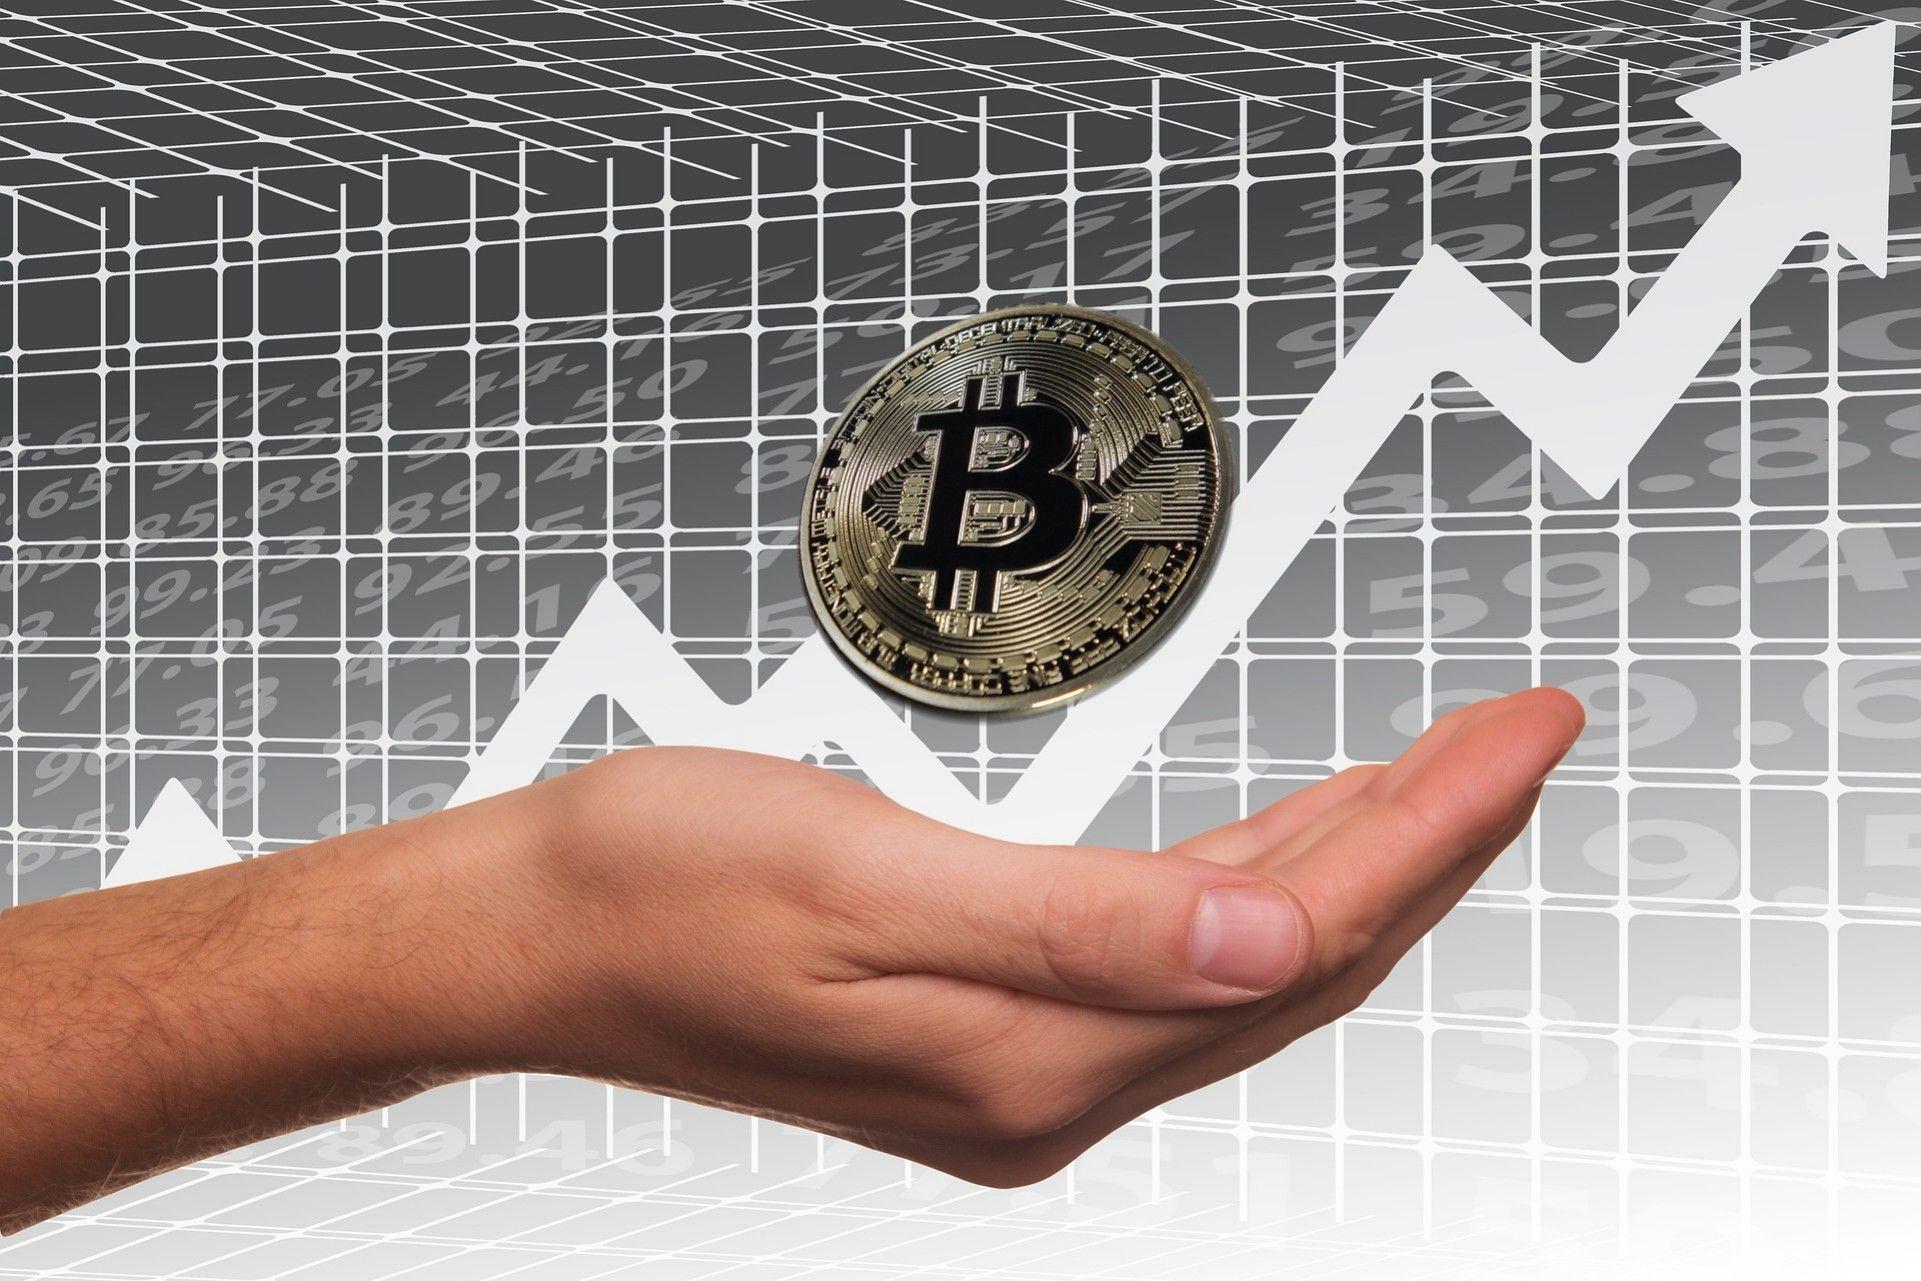 Img invertir bitcoin hd